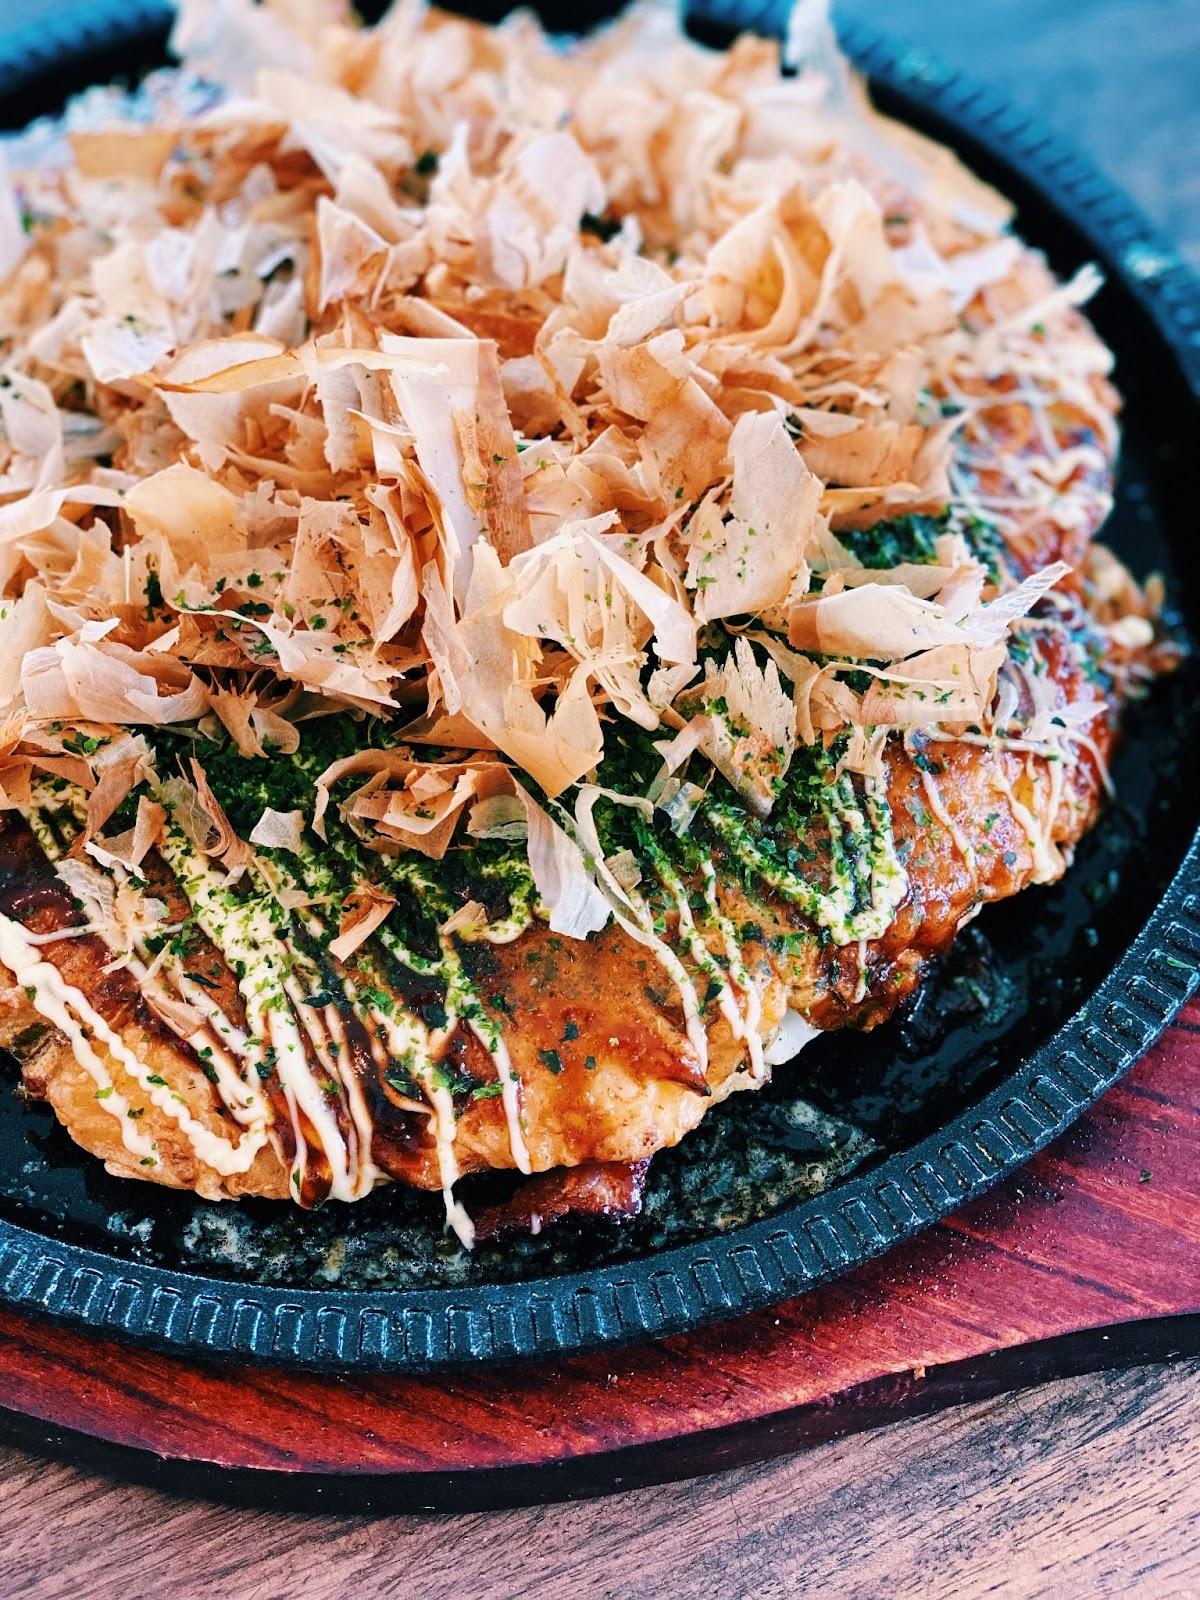 Okonomiyaki - Japanese Savory Cabbage Pancake